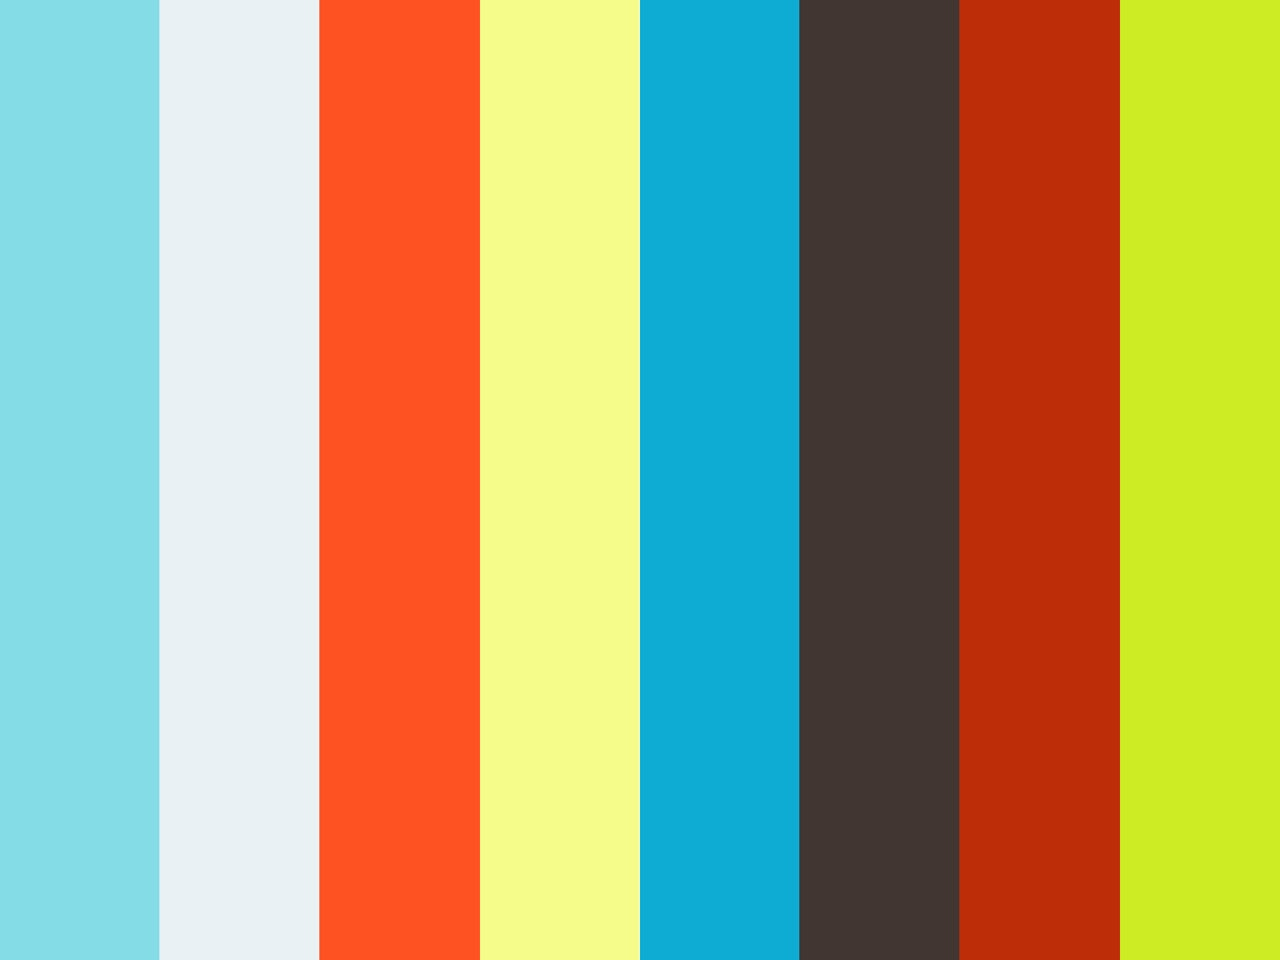 renee + billy | highlight reel